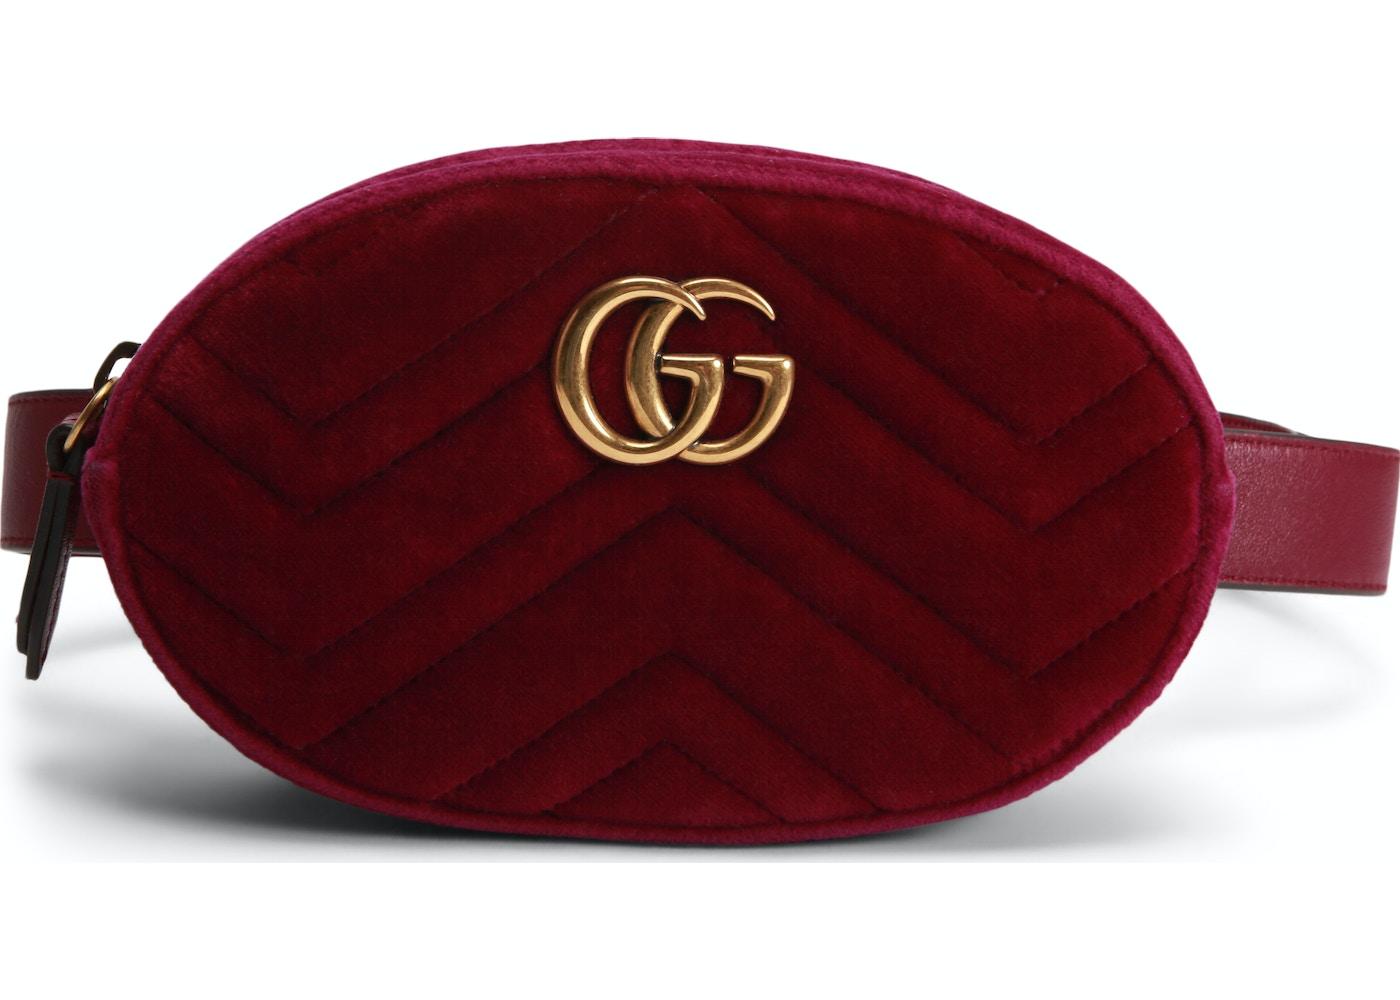 e838a201a82a Gucci Marmont Belt Bag Matelasse GG Fuchsia. Matelasse GG Fuchsia